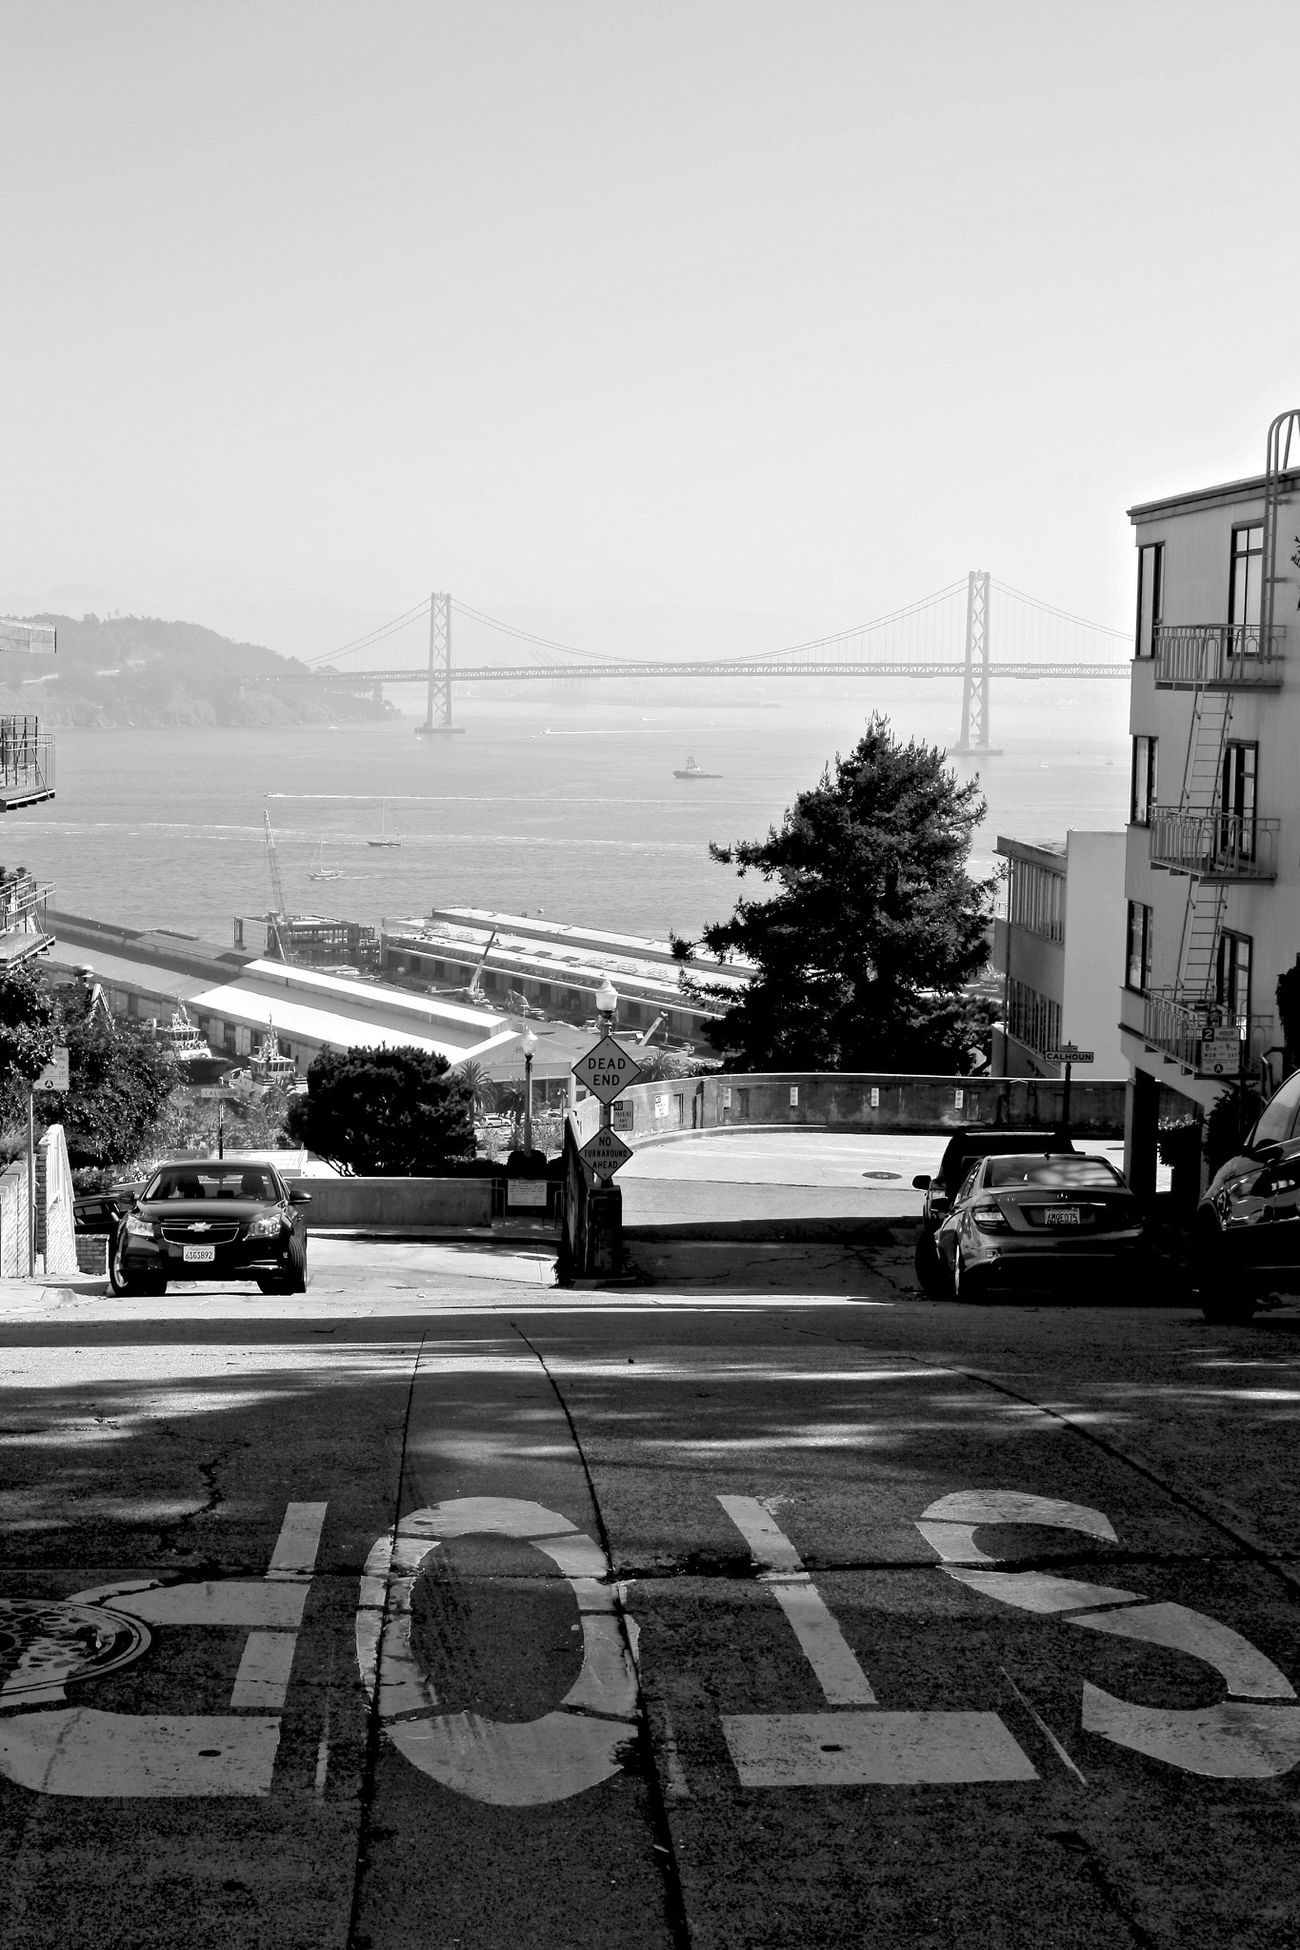 Walk This Way Streetphotography Streetphoto_bw EyeEm Best Shots EyeEm Best Shots - Black + White Golden Gate Bridge Blackandwhite Black And White Black & White